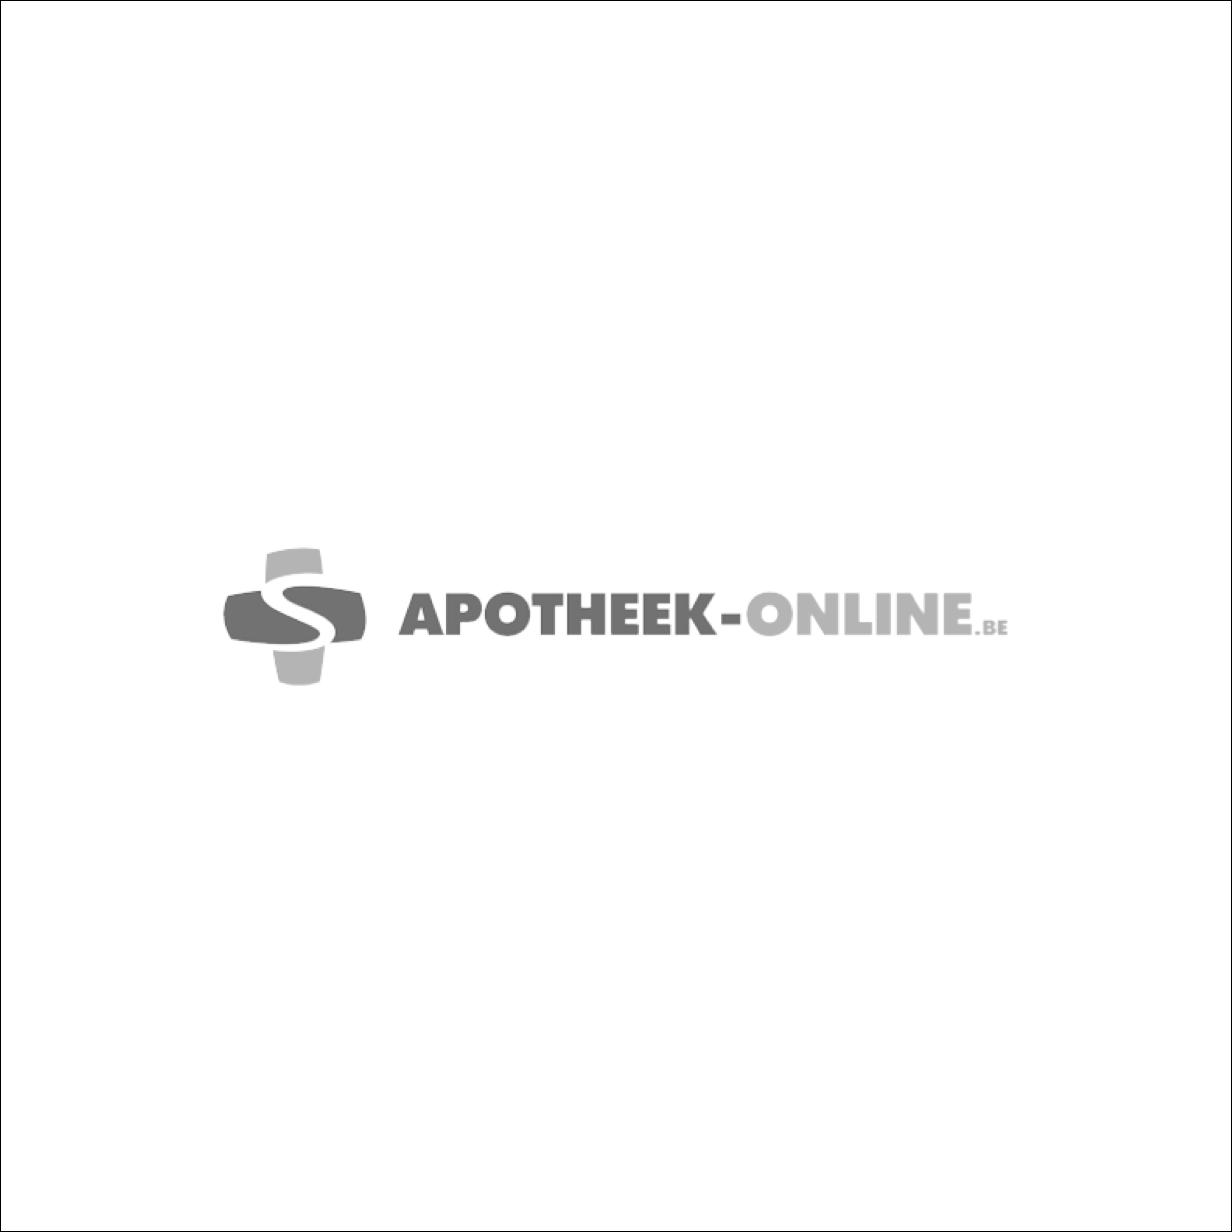 Canestene Derm Bifonazole 1% Crème Tube 15g